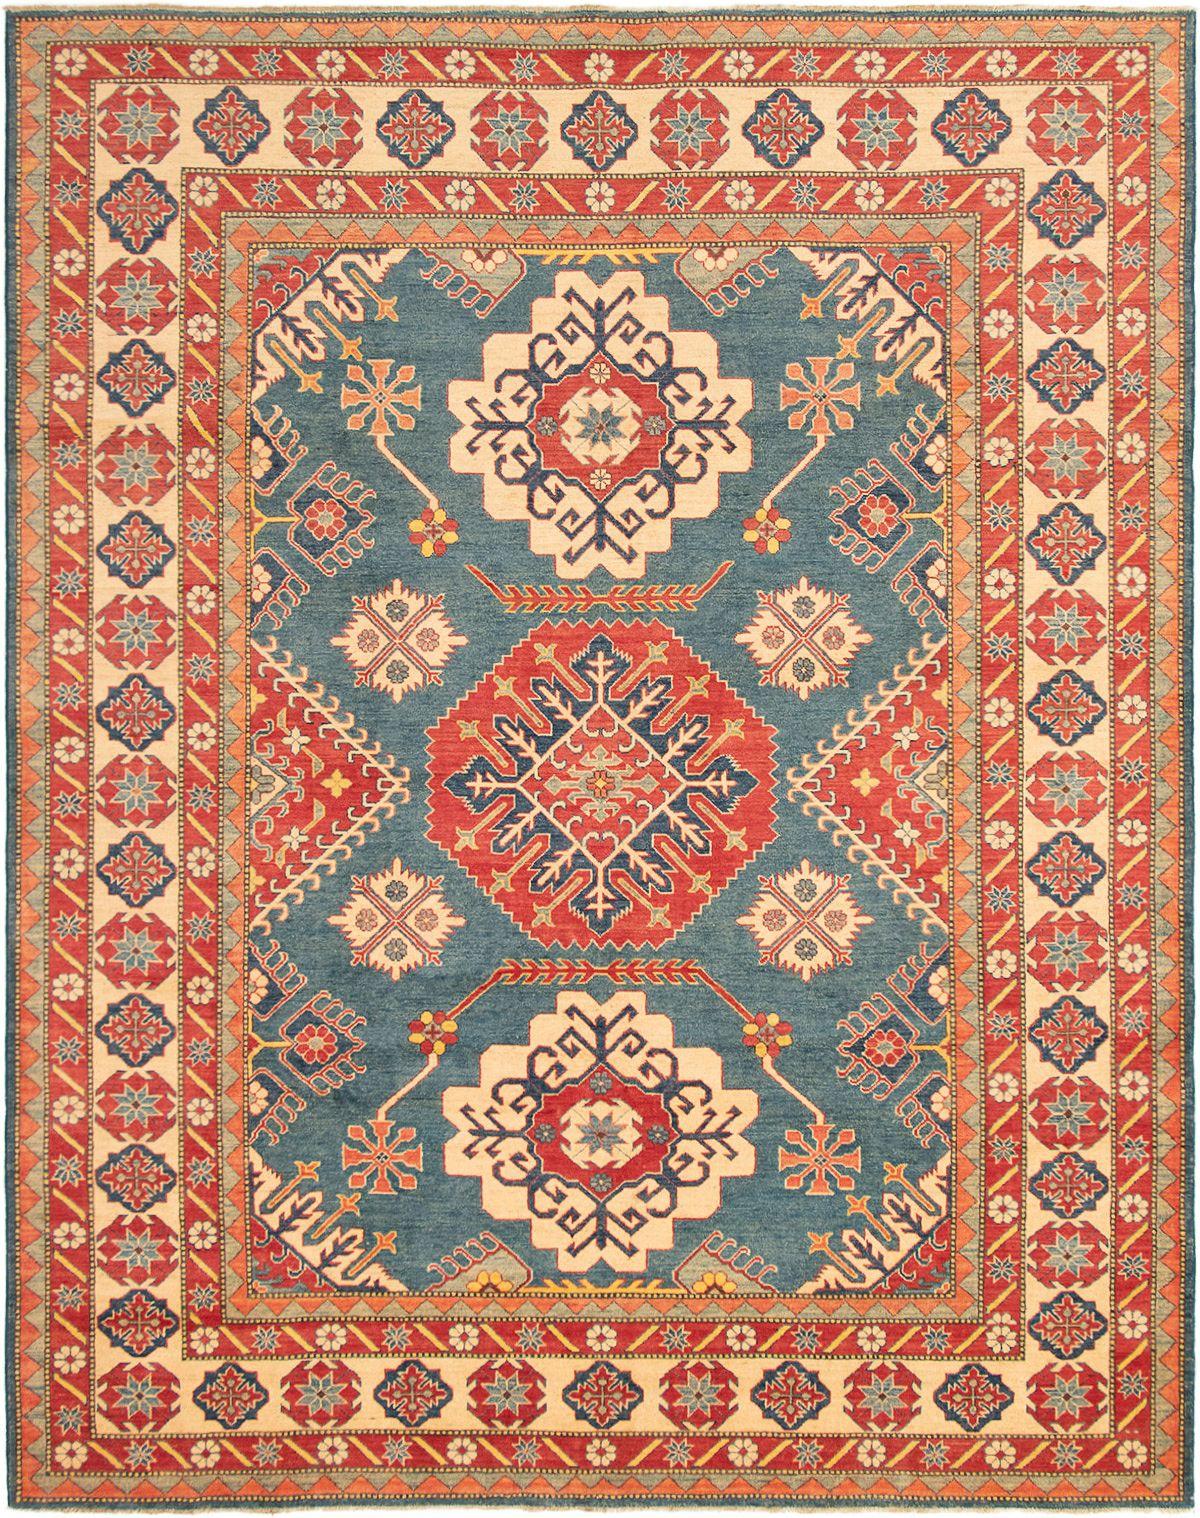 "Hand-knotted Finest Gazni Dark Blue Wool Rug 9'10"" x 12'5"" Size: 9'10"" x 12'5"""